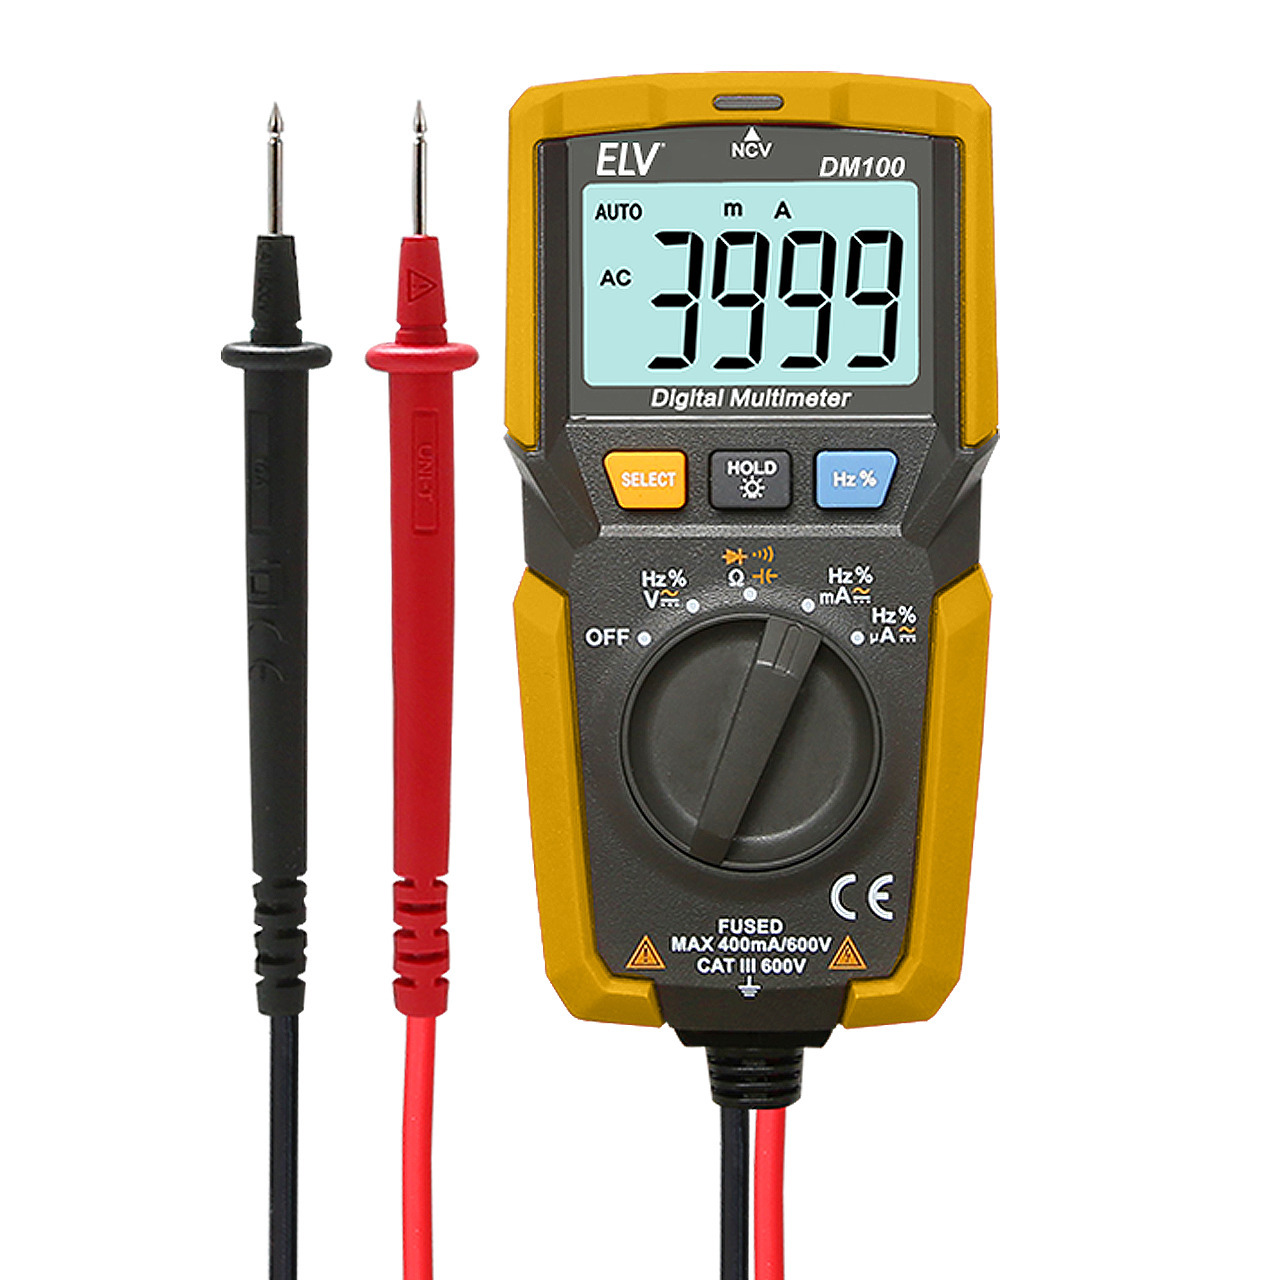 ELV digitales Pocket-Multimeter DM100- inkl- berührungsloser Spannungsprüfer